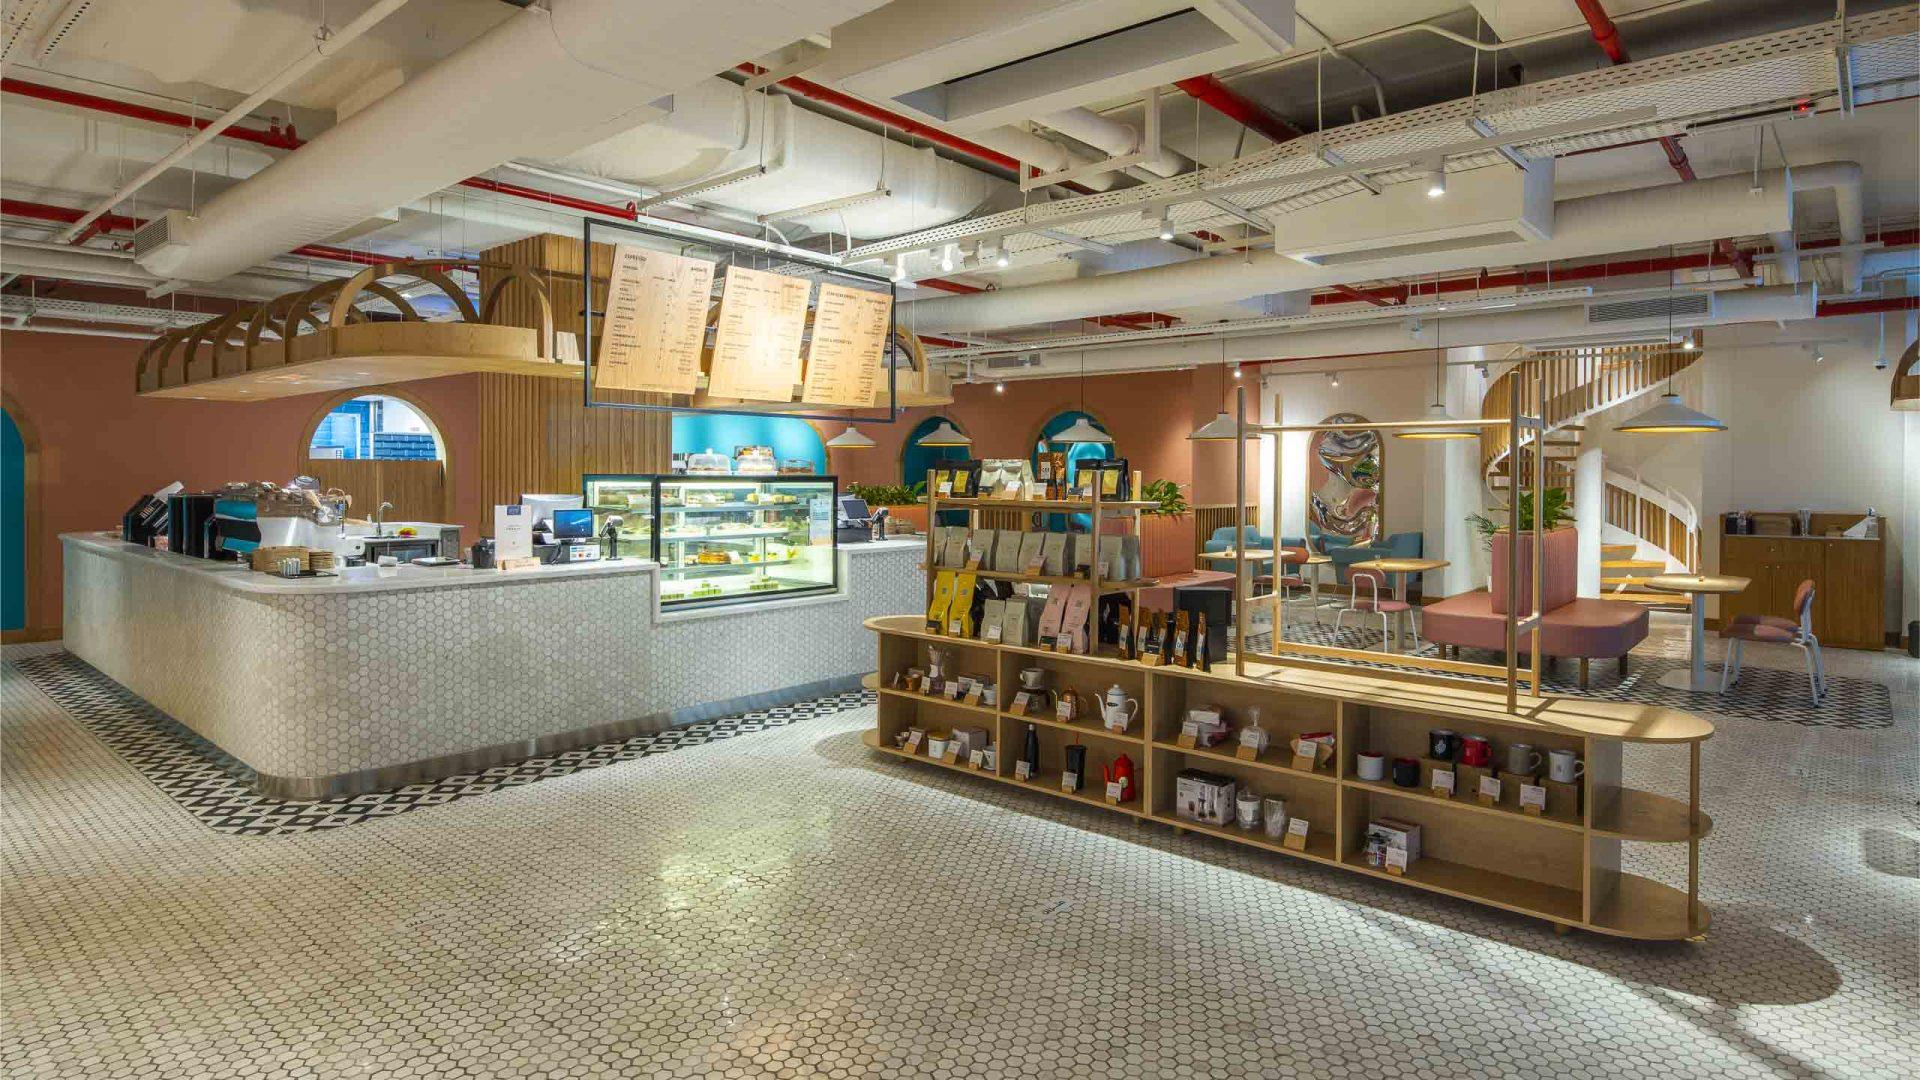 Brew92 Coffee Shop, Mecca. Photograph of the the upper basement level interior design by Liqui.